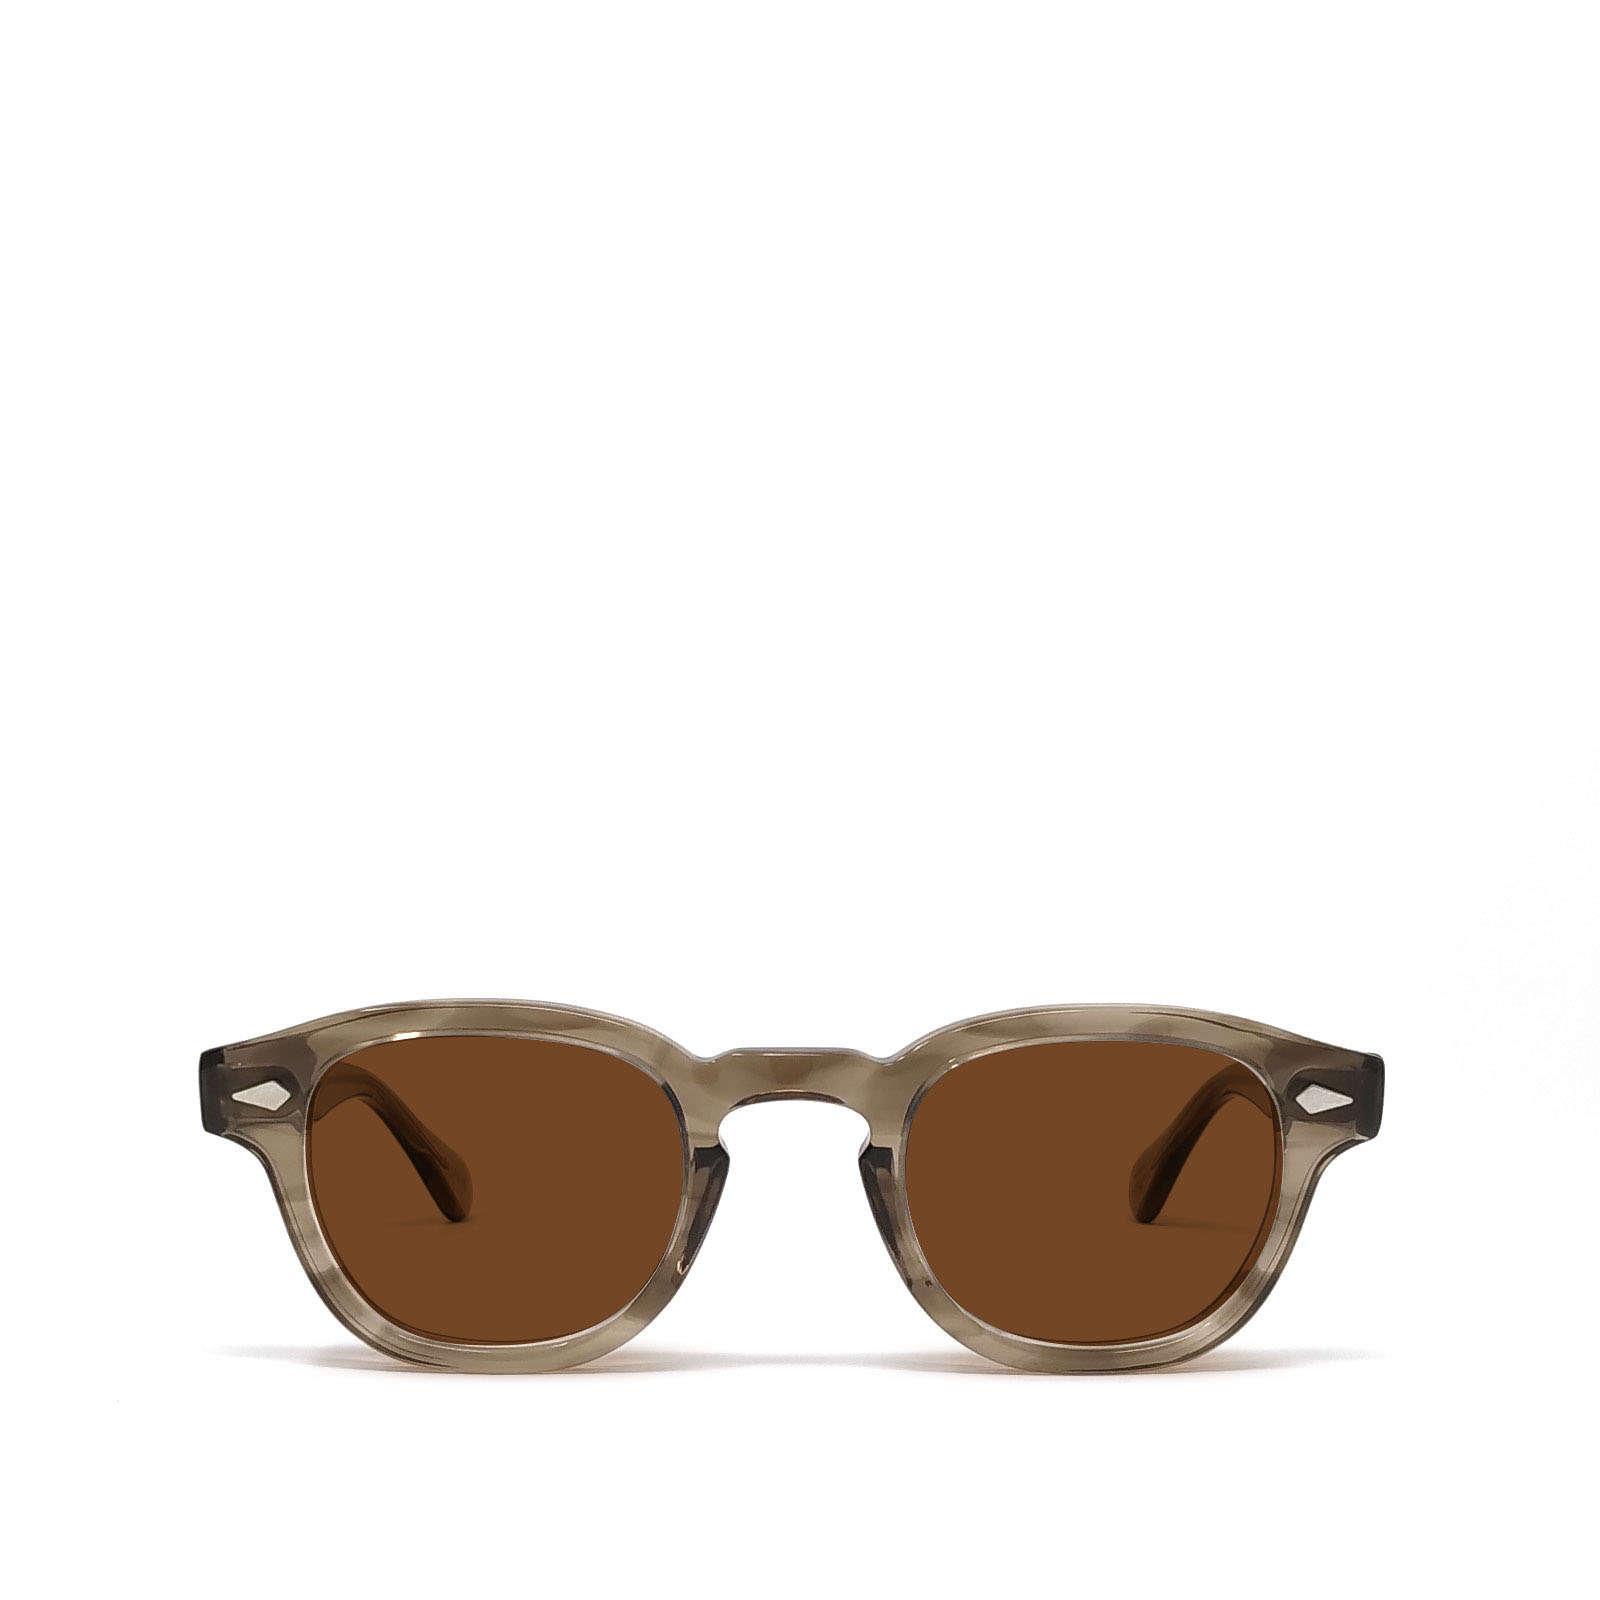 Moscot Moscot Lemtosh Brown Ash Sunglasses